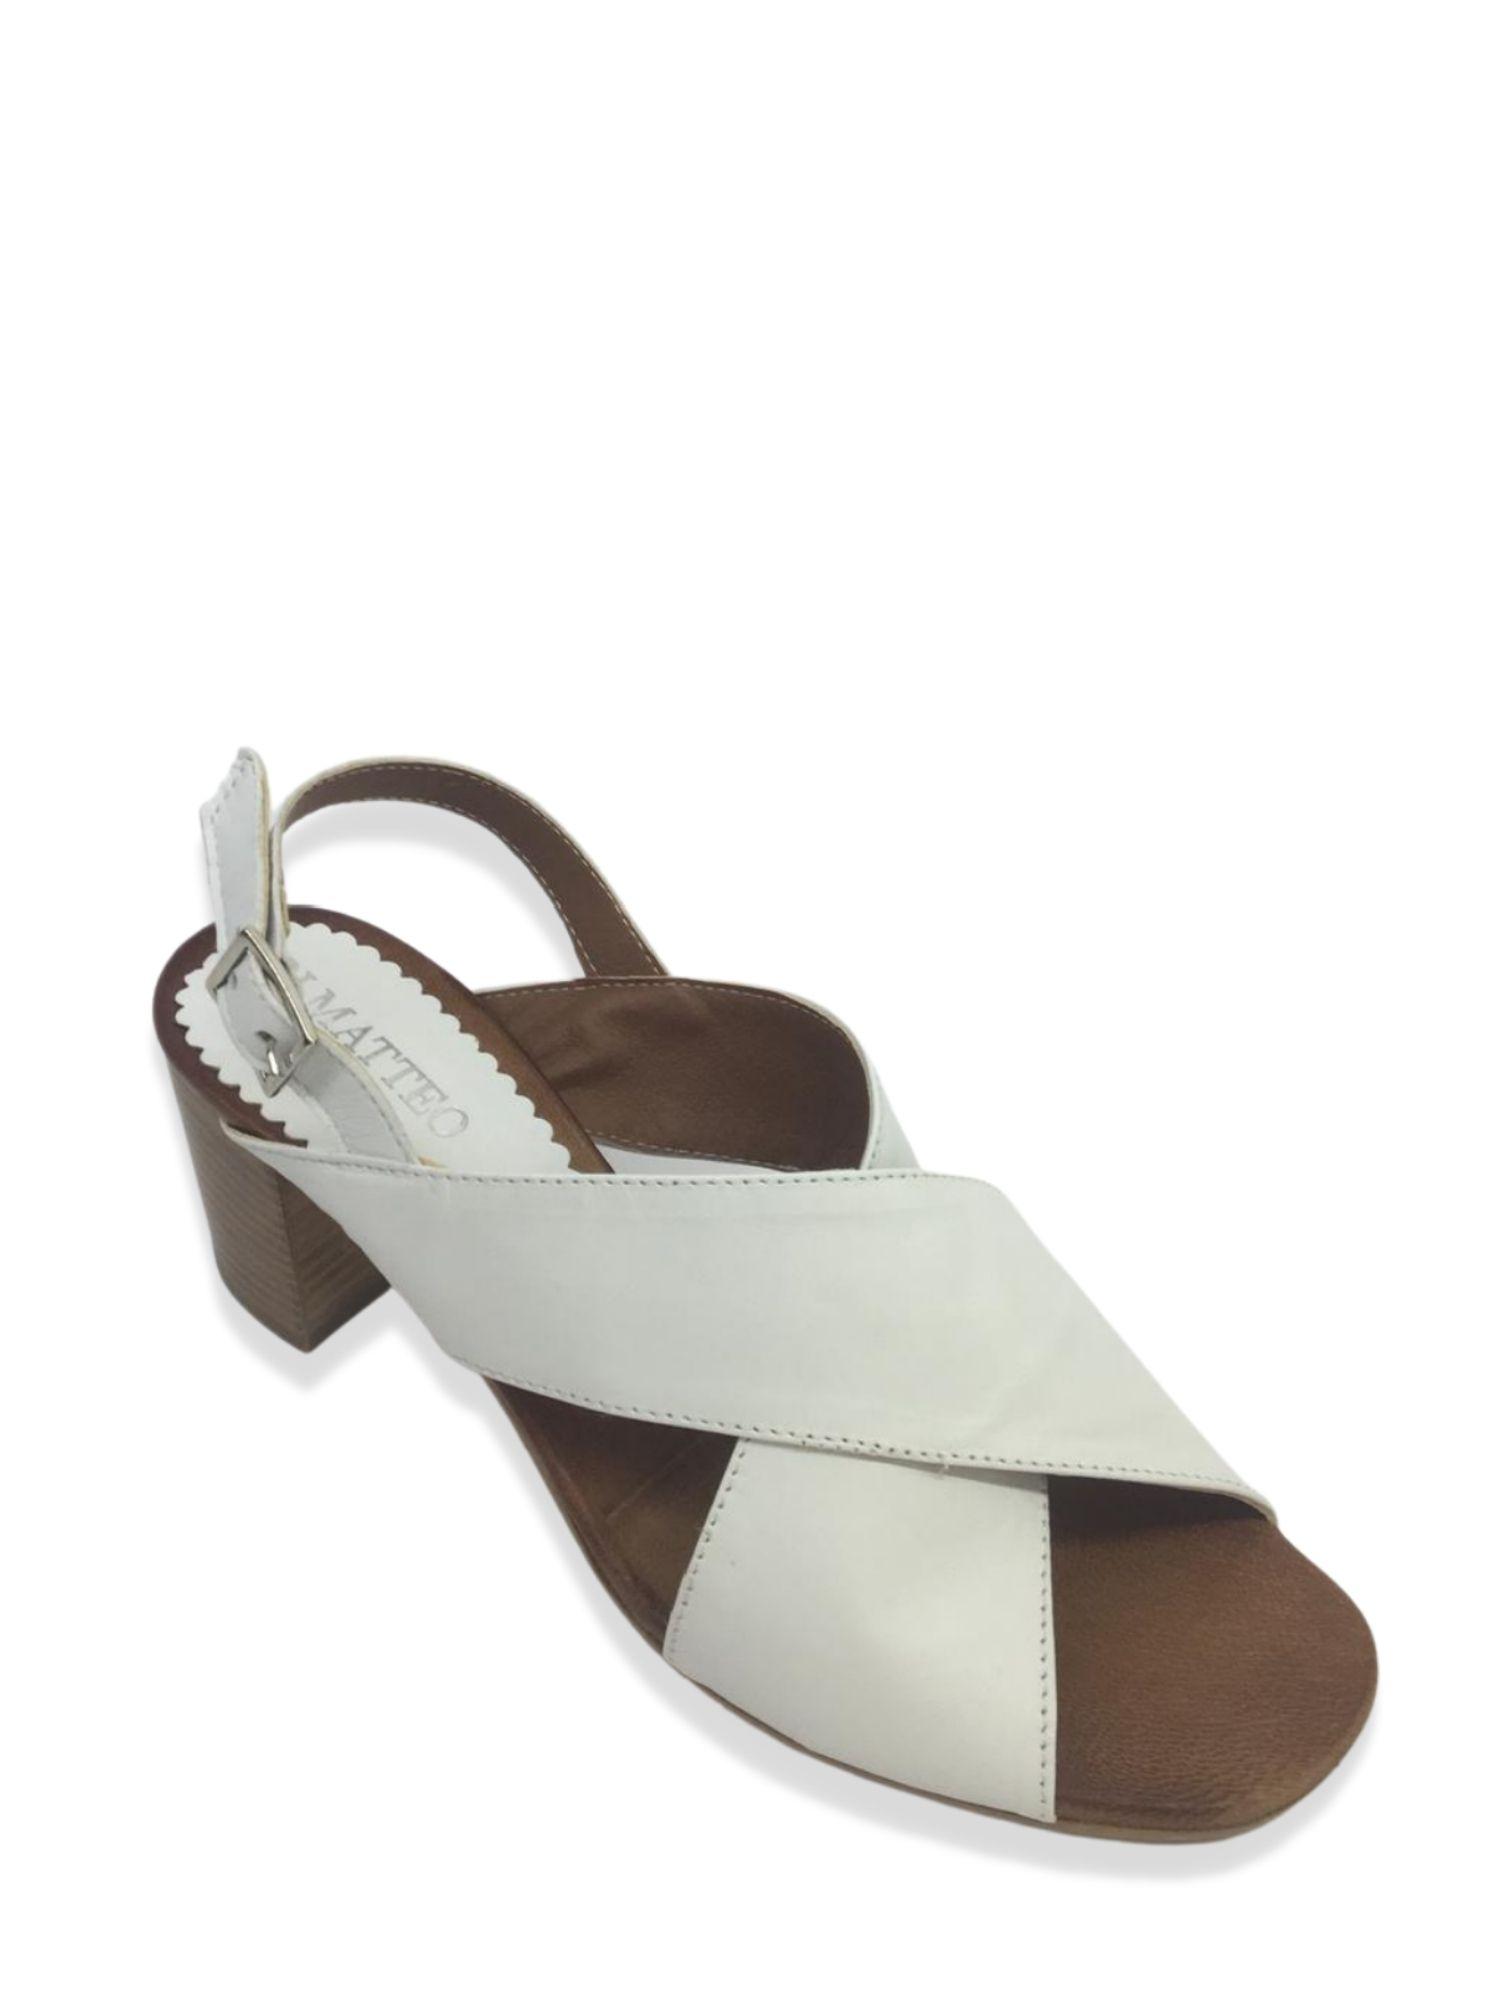 Sandalo Made in Italy 505 Bianco alto 2